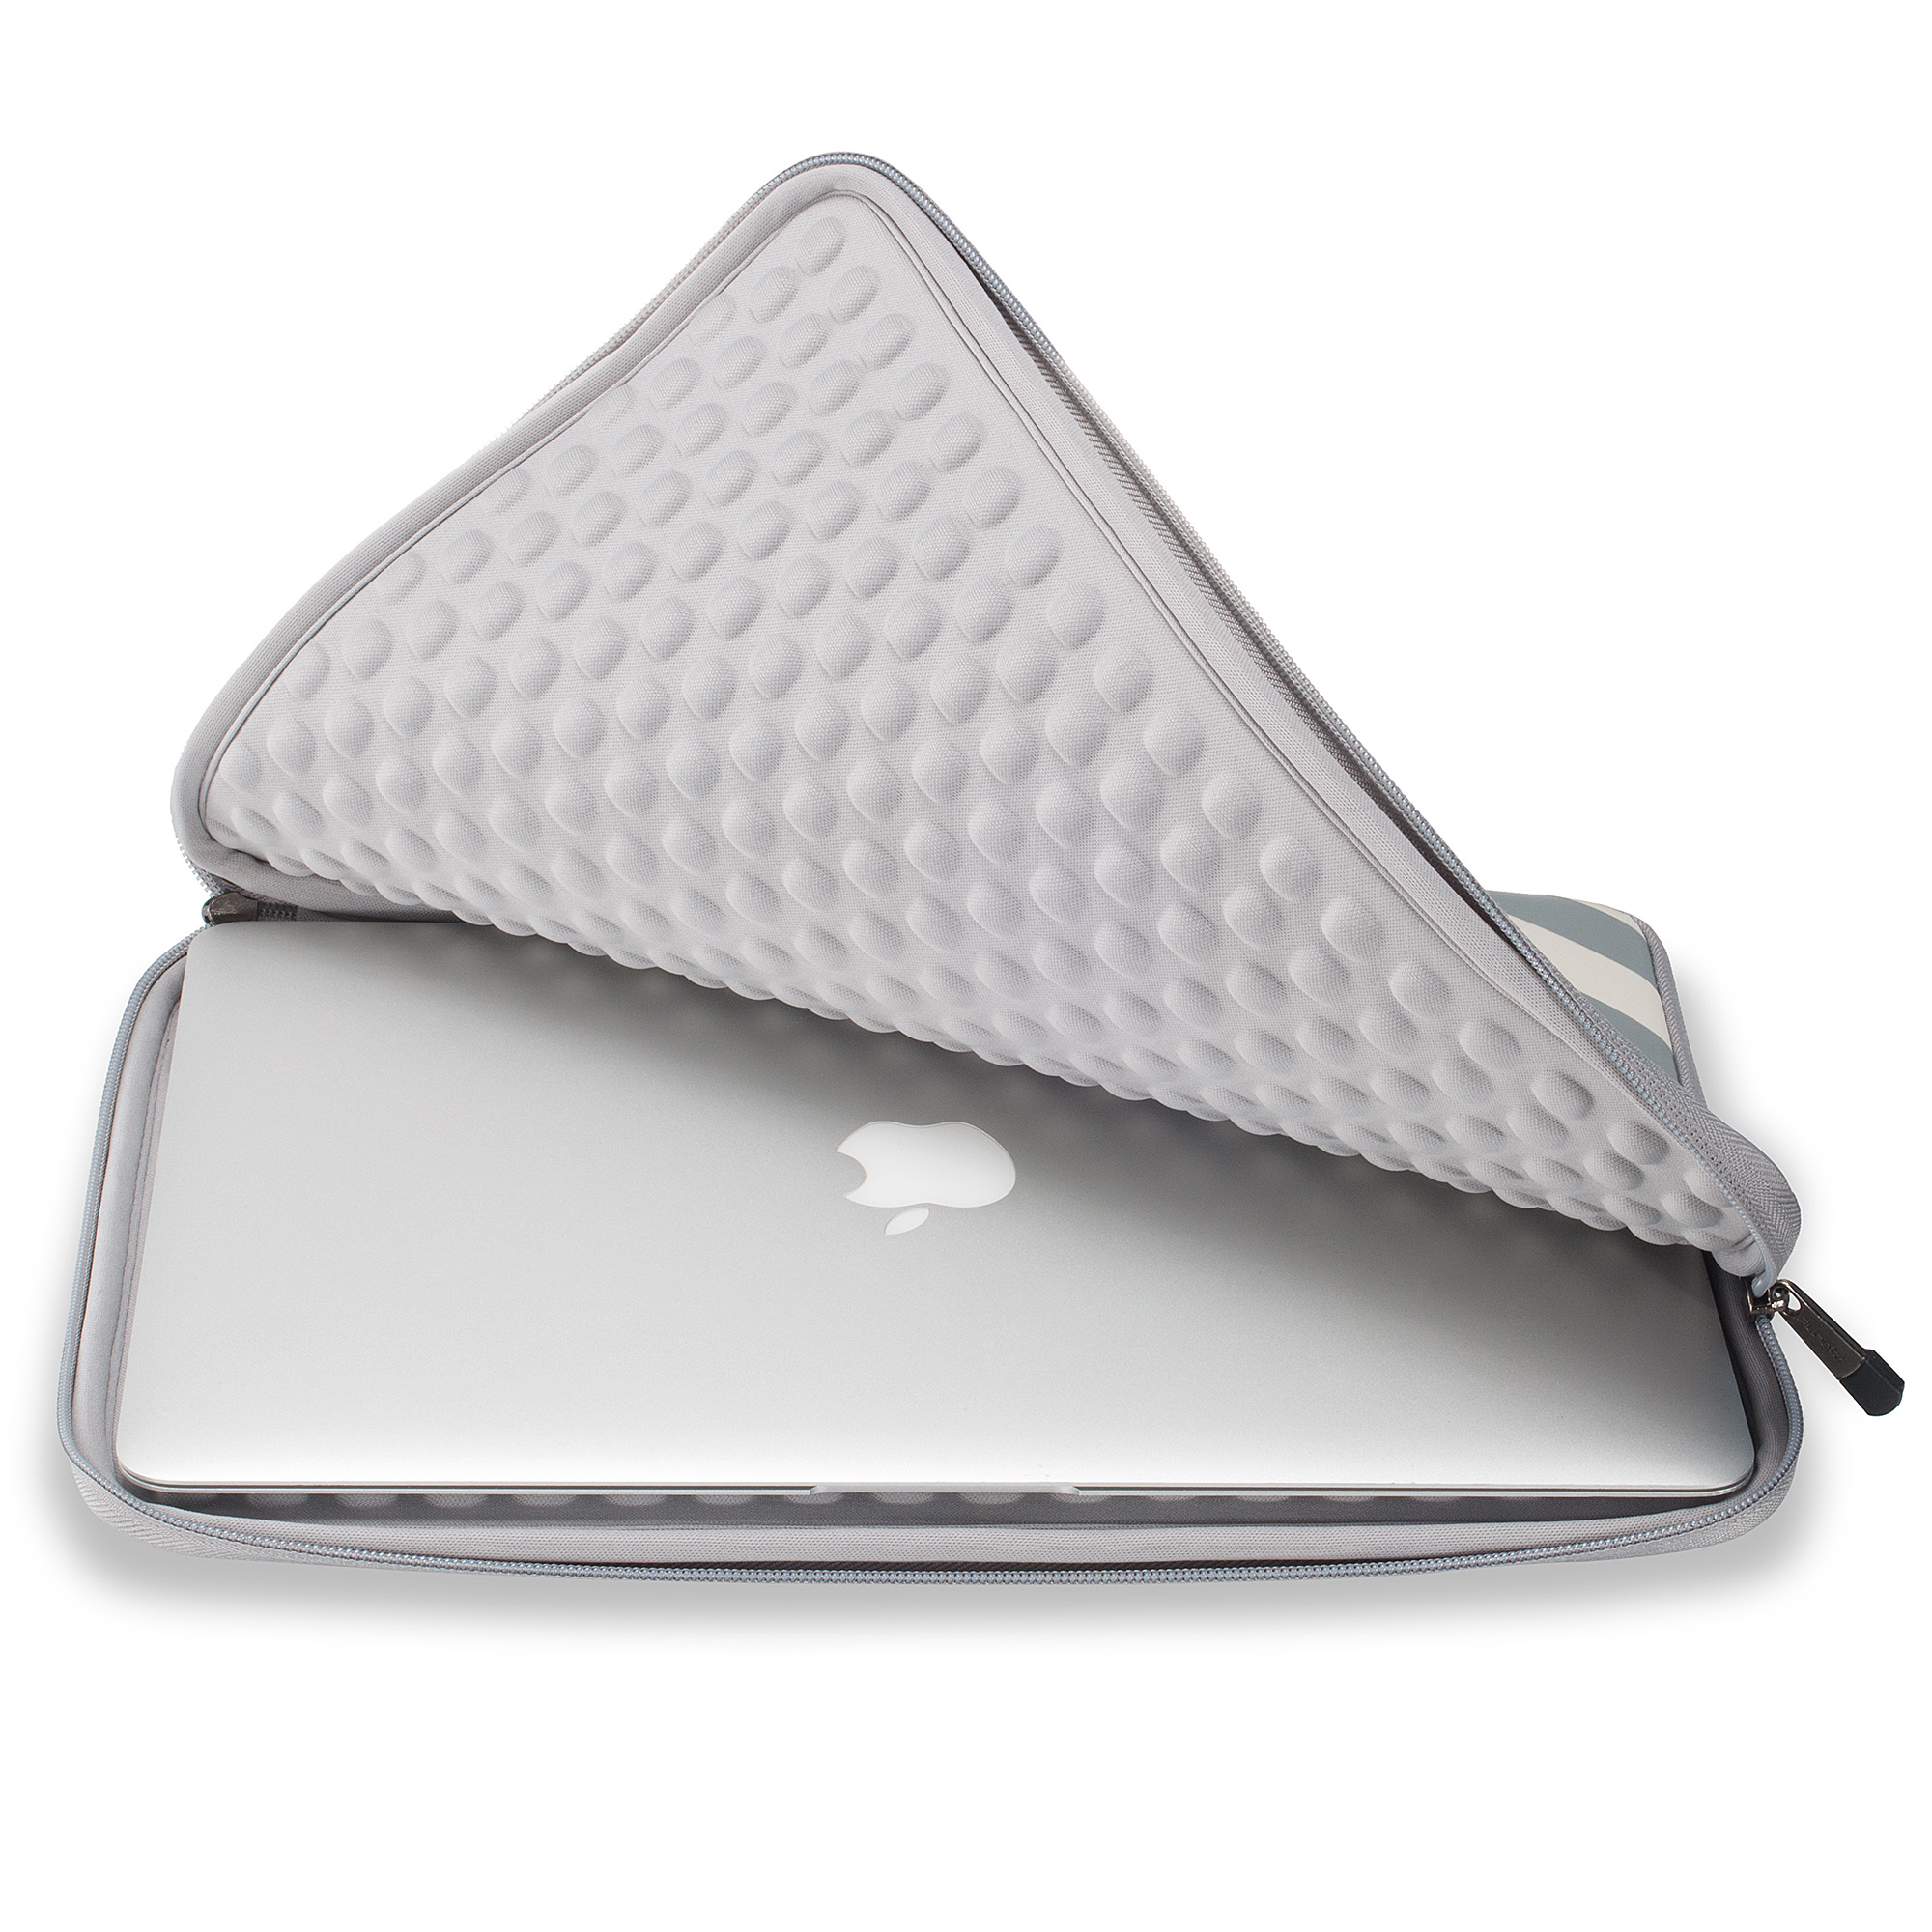 Macbook pro retina 13 case